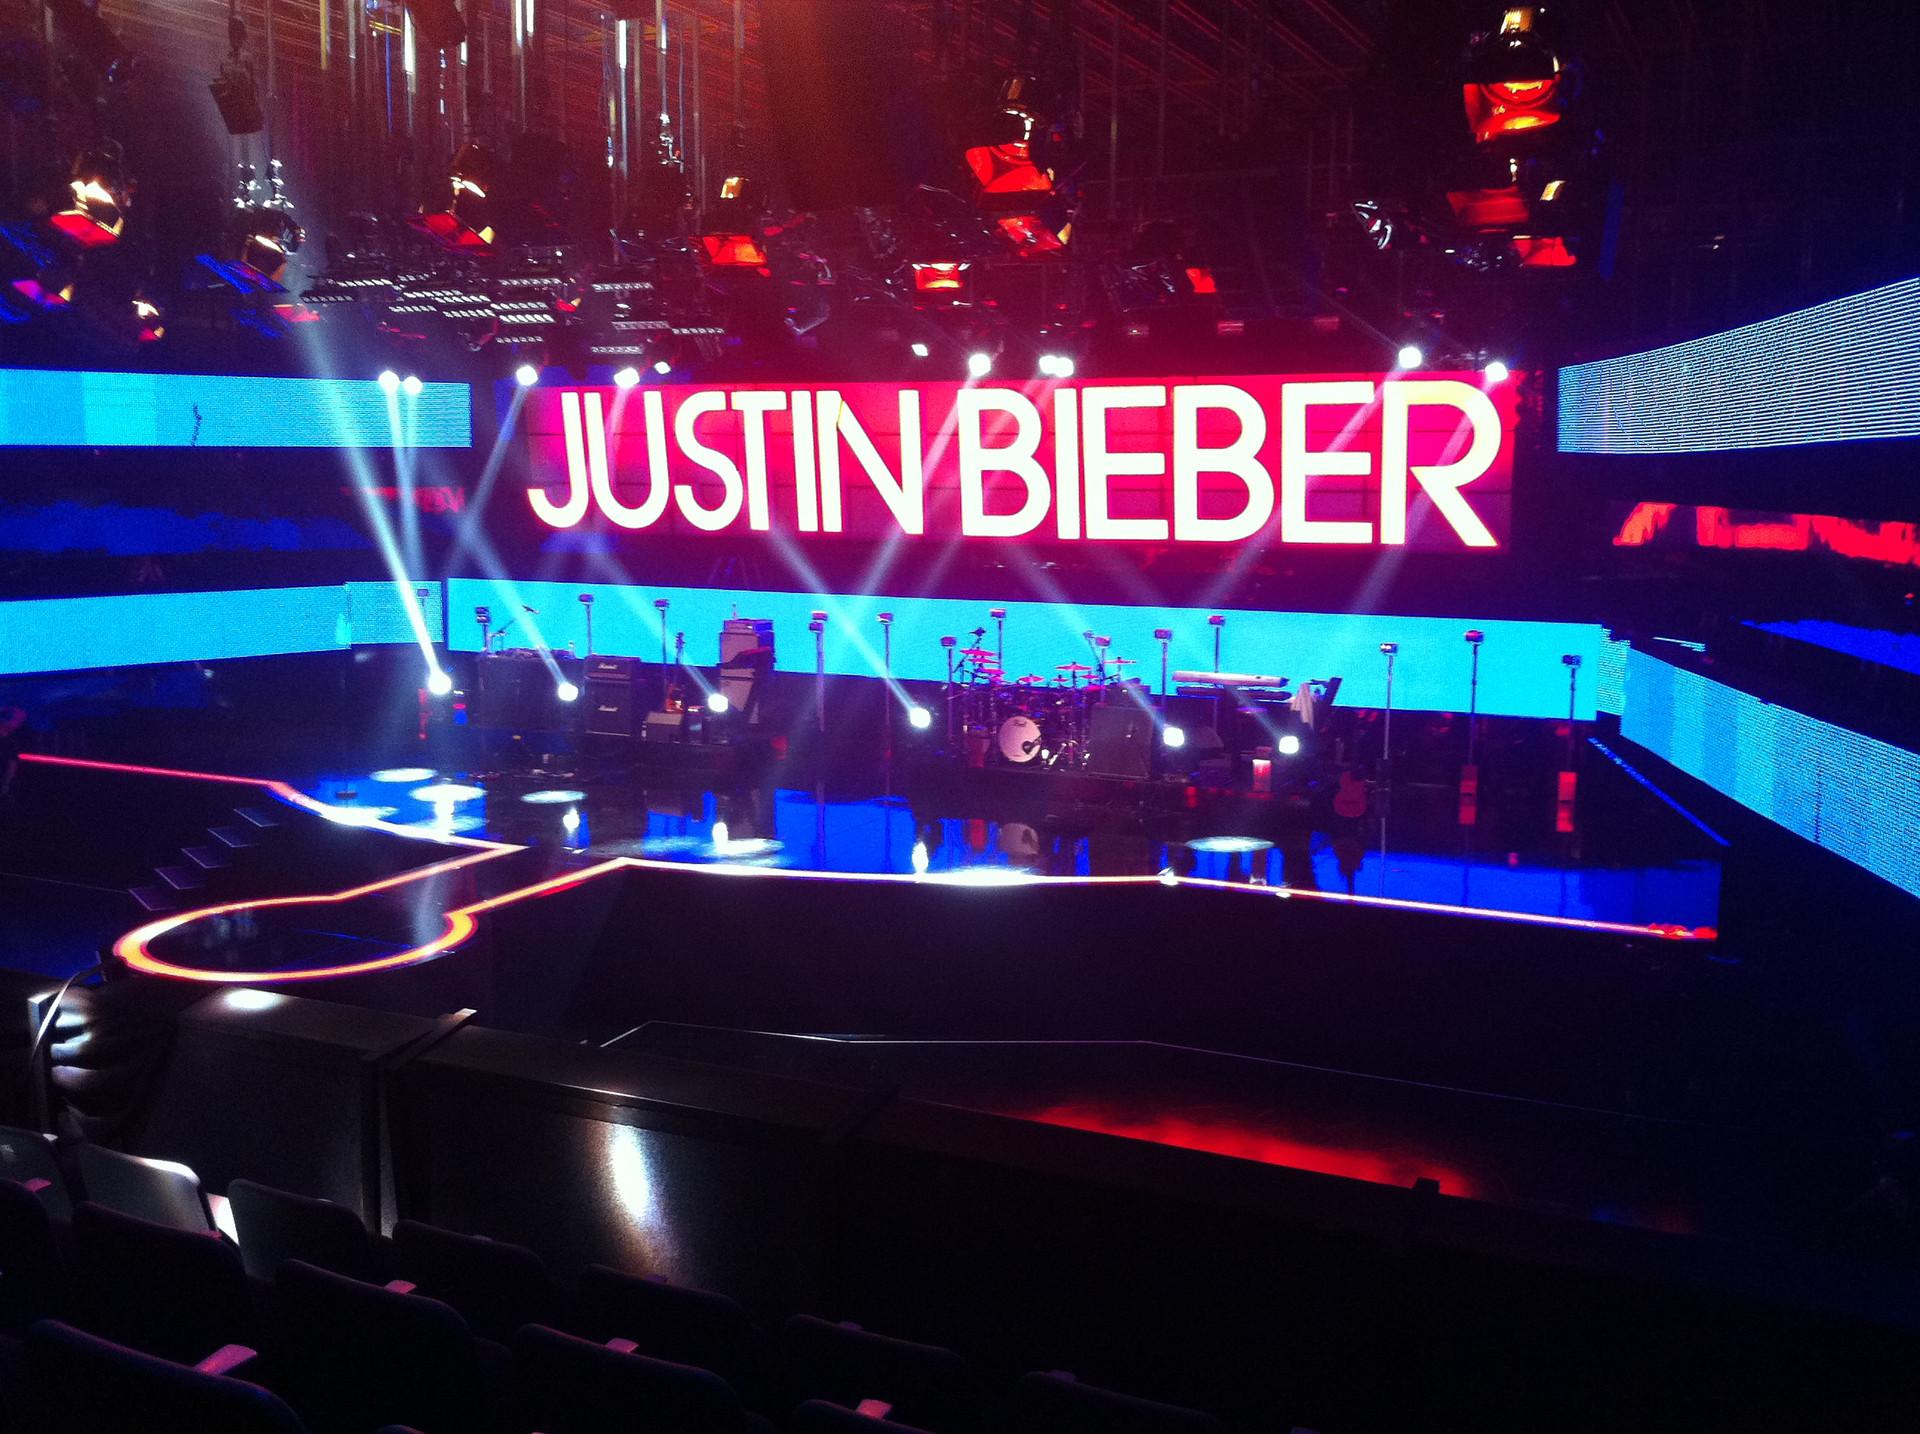 Justin Bieber ITV